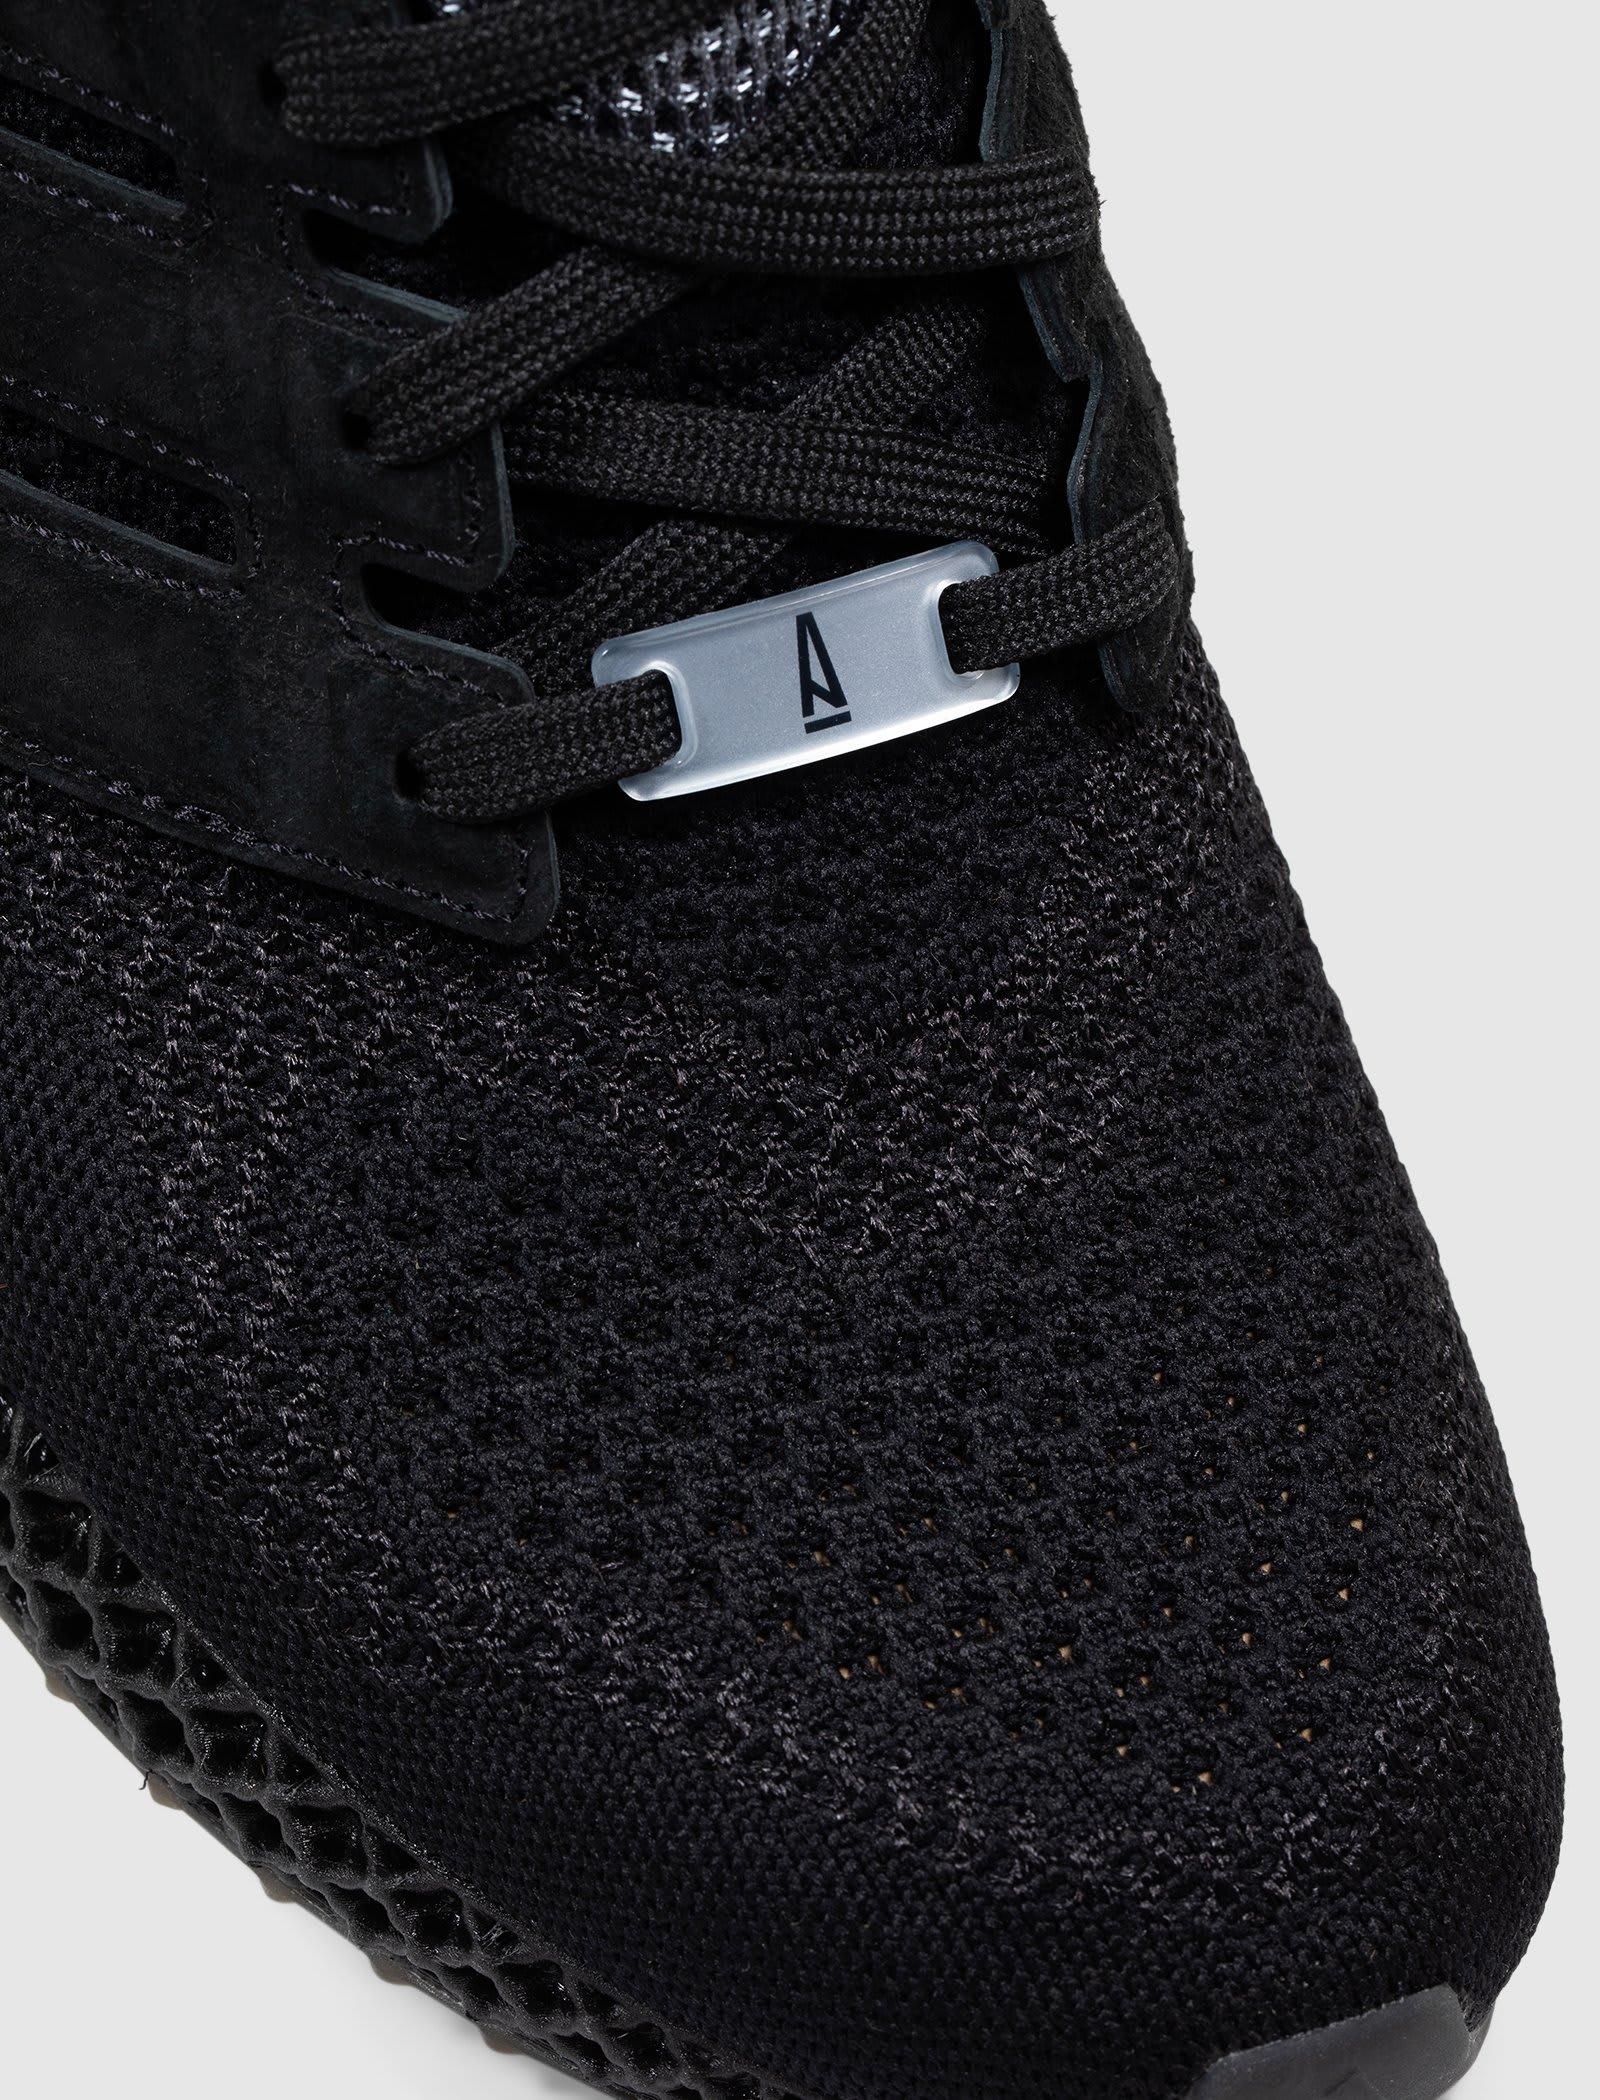 A Ma Maniere Adidas Ultra 4D G55274 Release Date Toe Detail